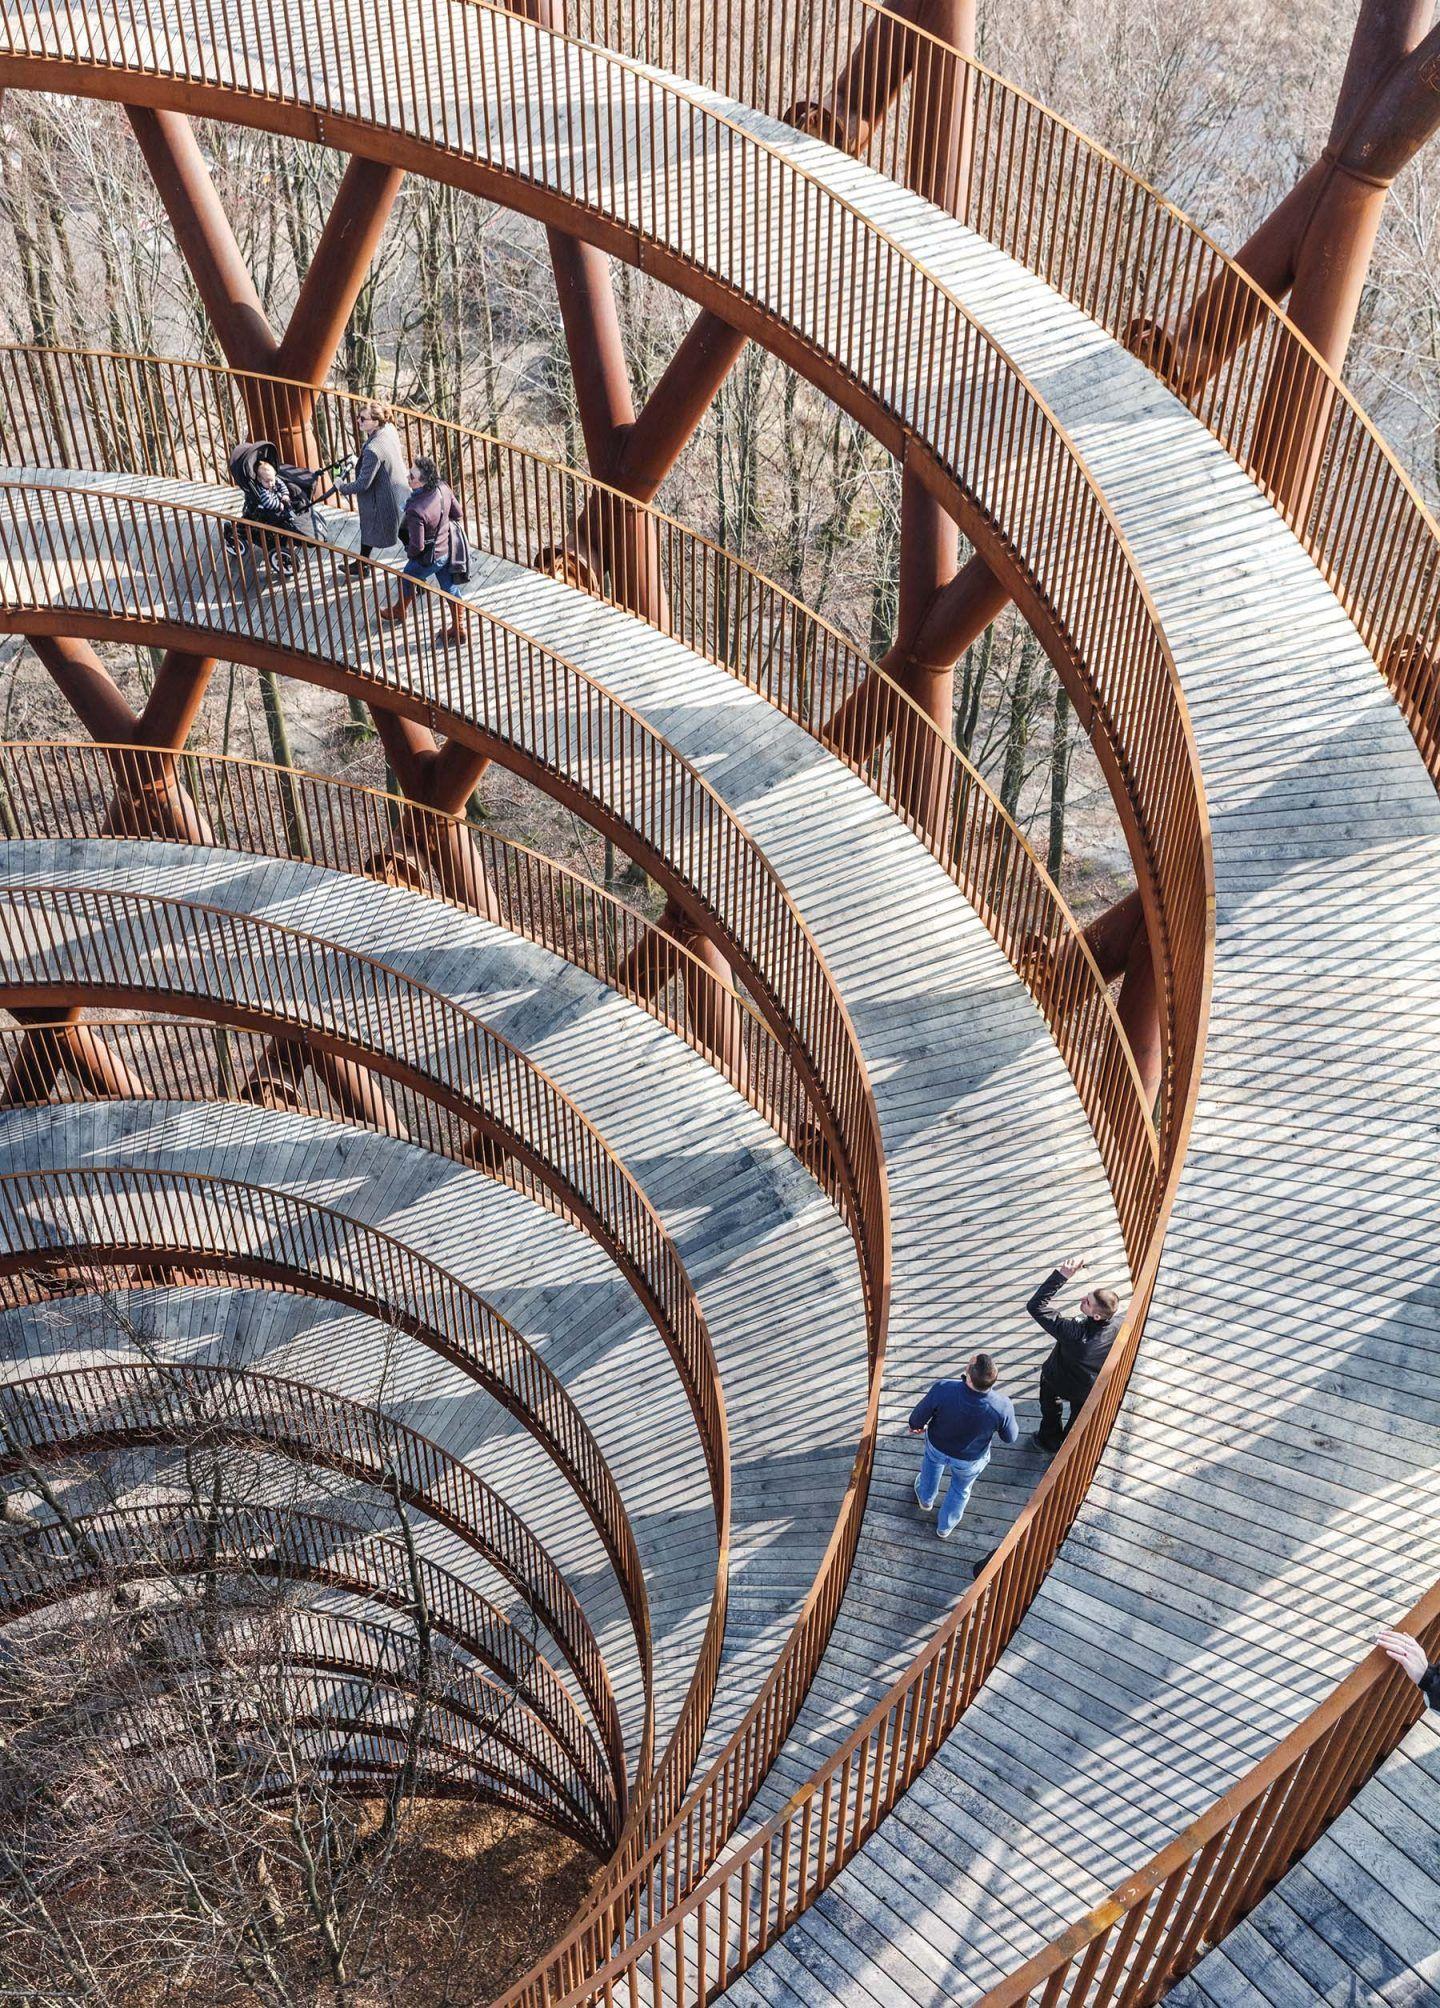 IGNANT-Architecture-Effekt-Camp-Adventure-Tower-9